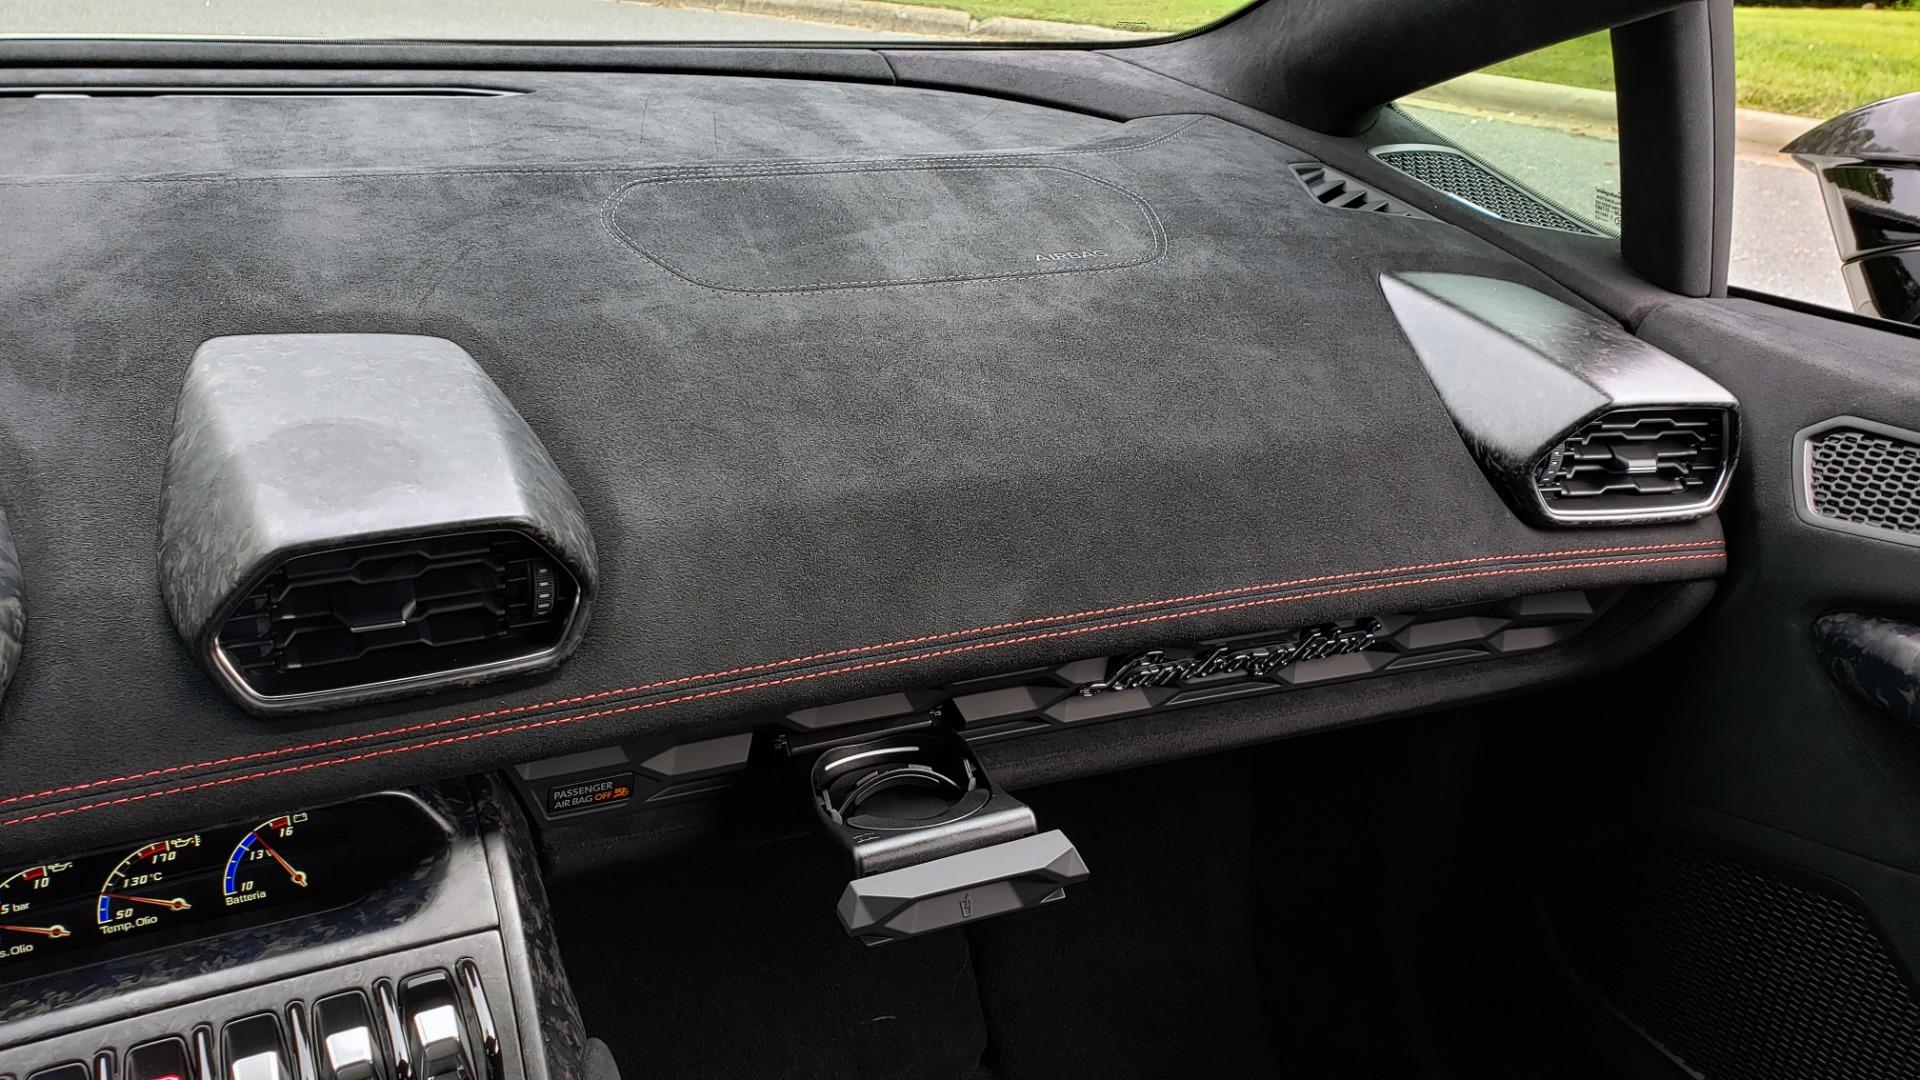 Used 2018 Lamborghini HURACAN PERFORMANTE 5.2L V10 / 630HP / 7-SPD AUTO / AWD / NAV / PREM SND for sale $269,995 at Formula Imports in Charlotte NC 28227 53